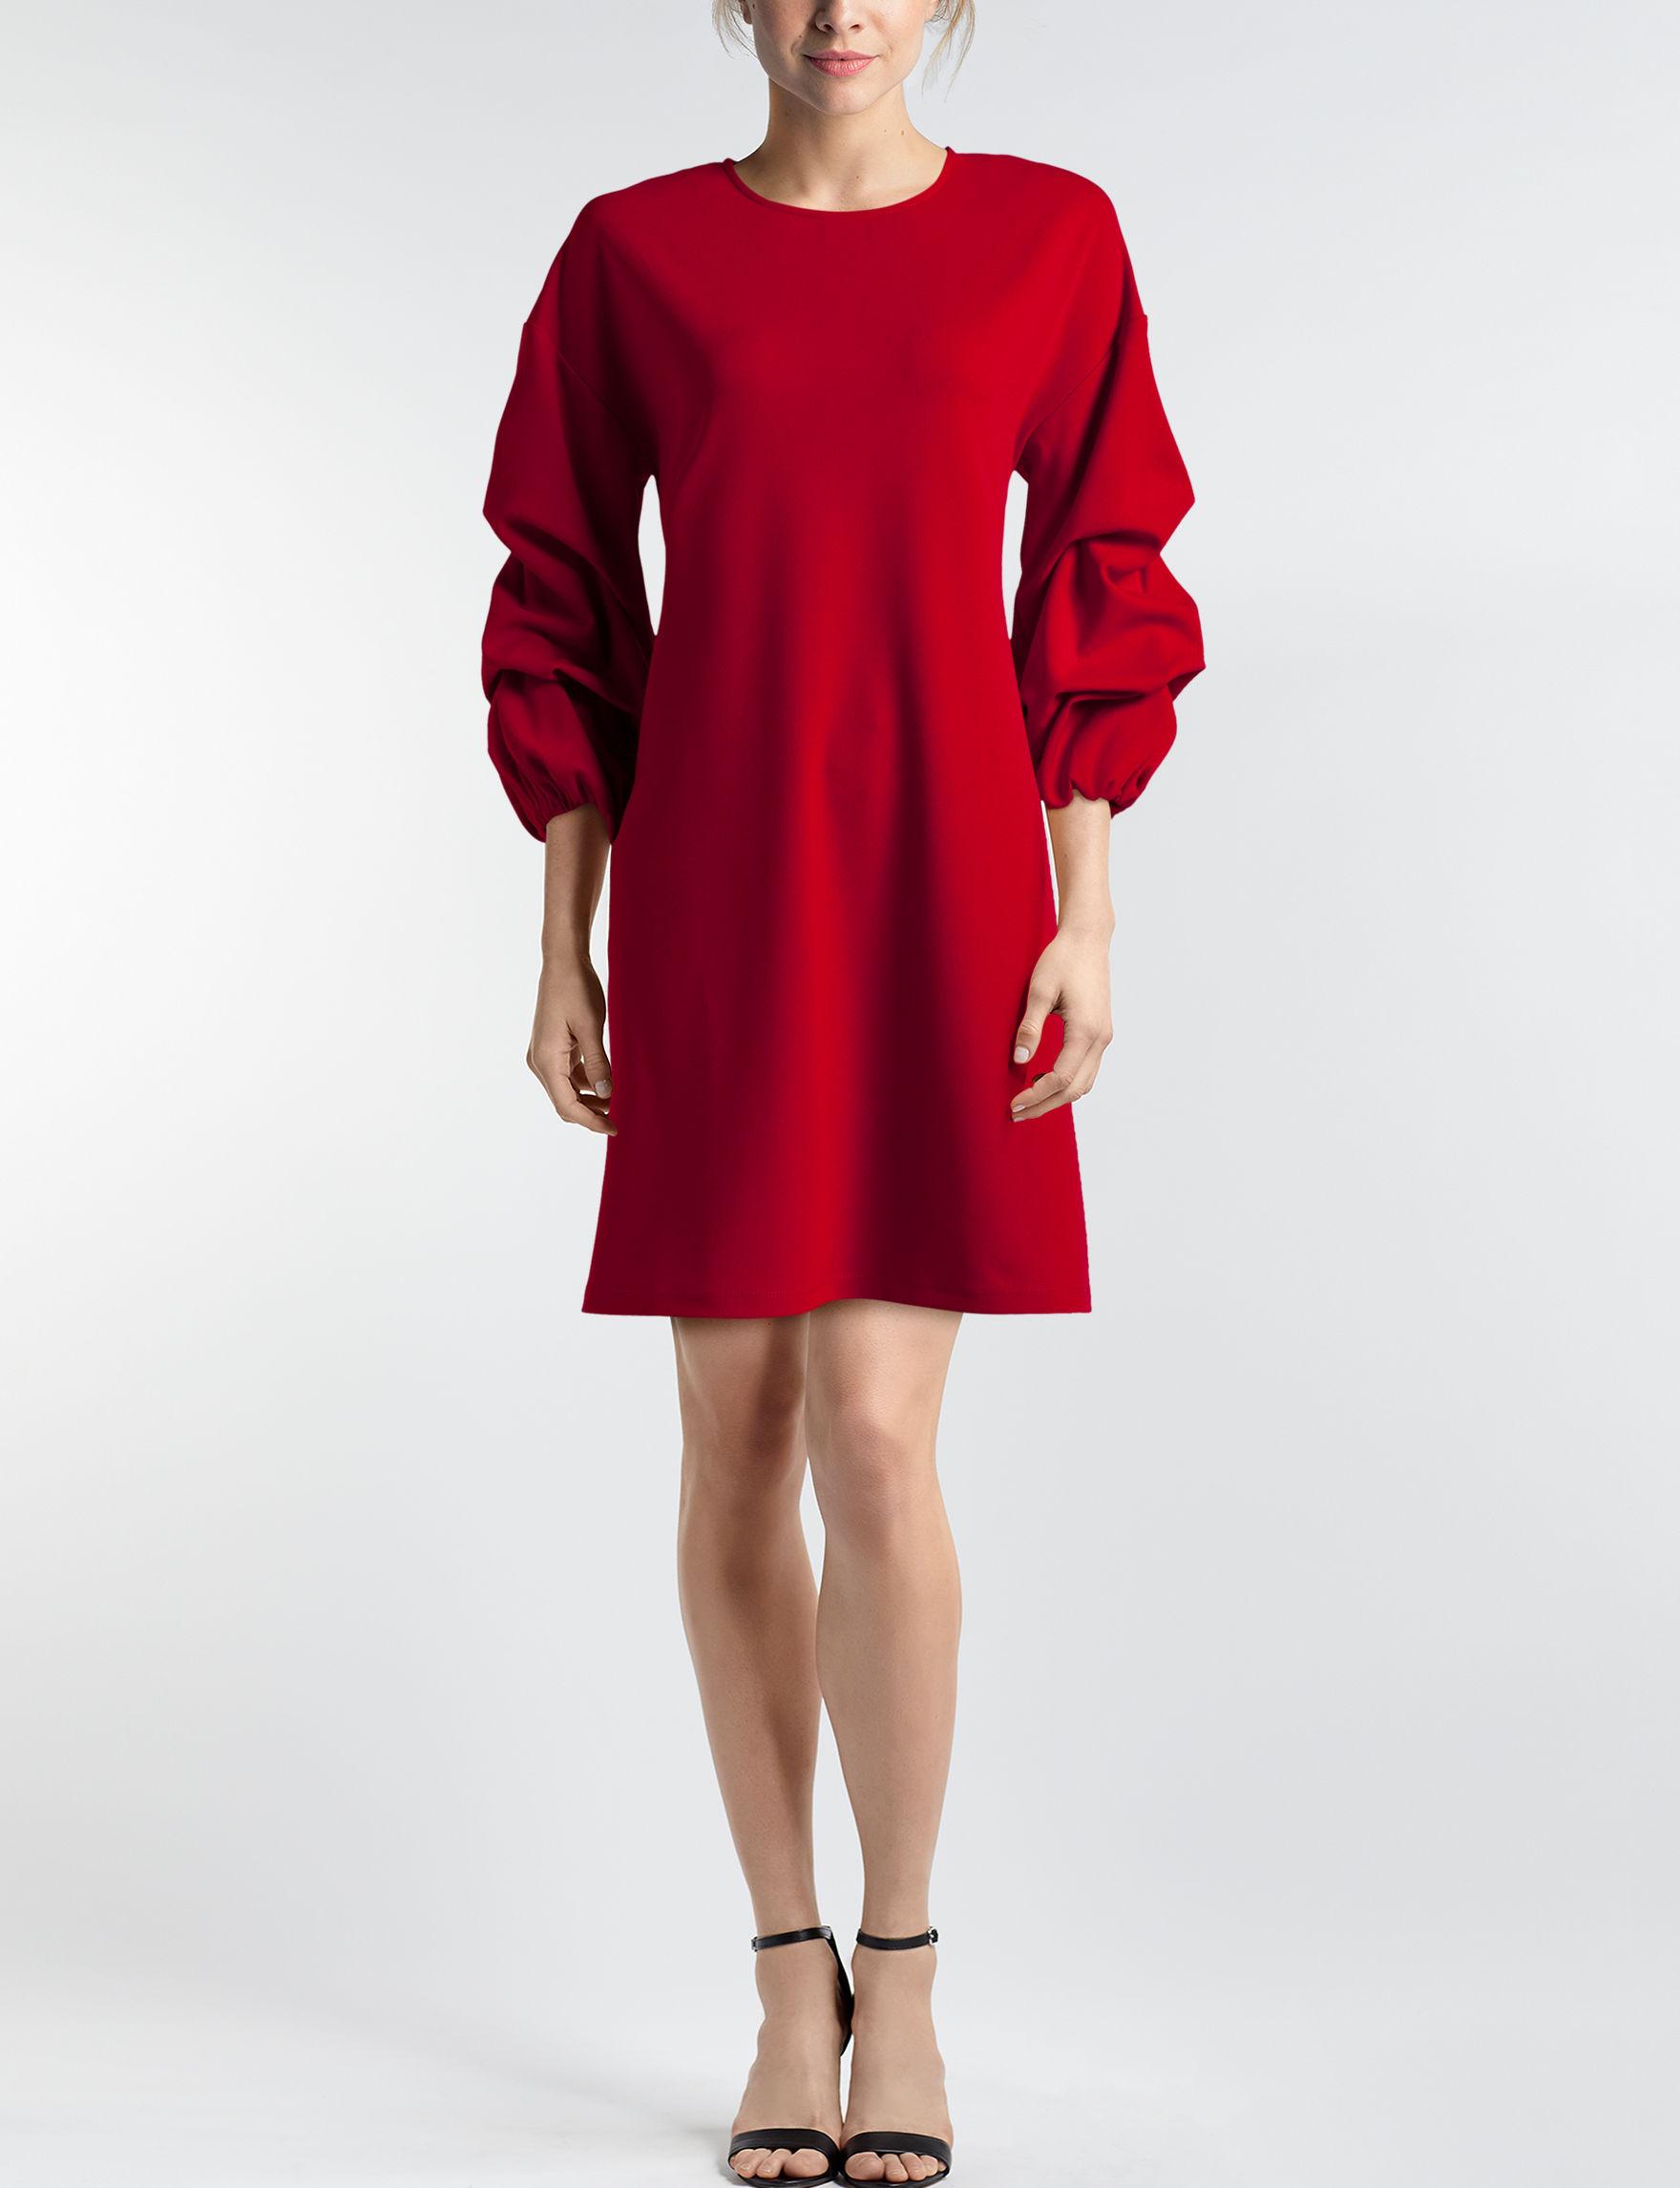 Nina Leonard Red Everyday & Casual Shift Dresses